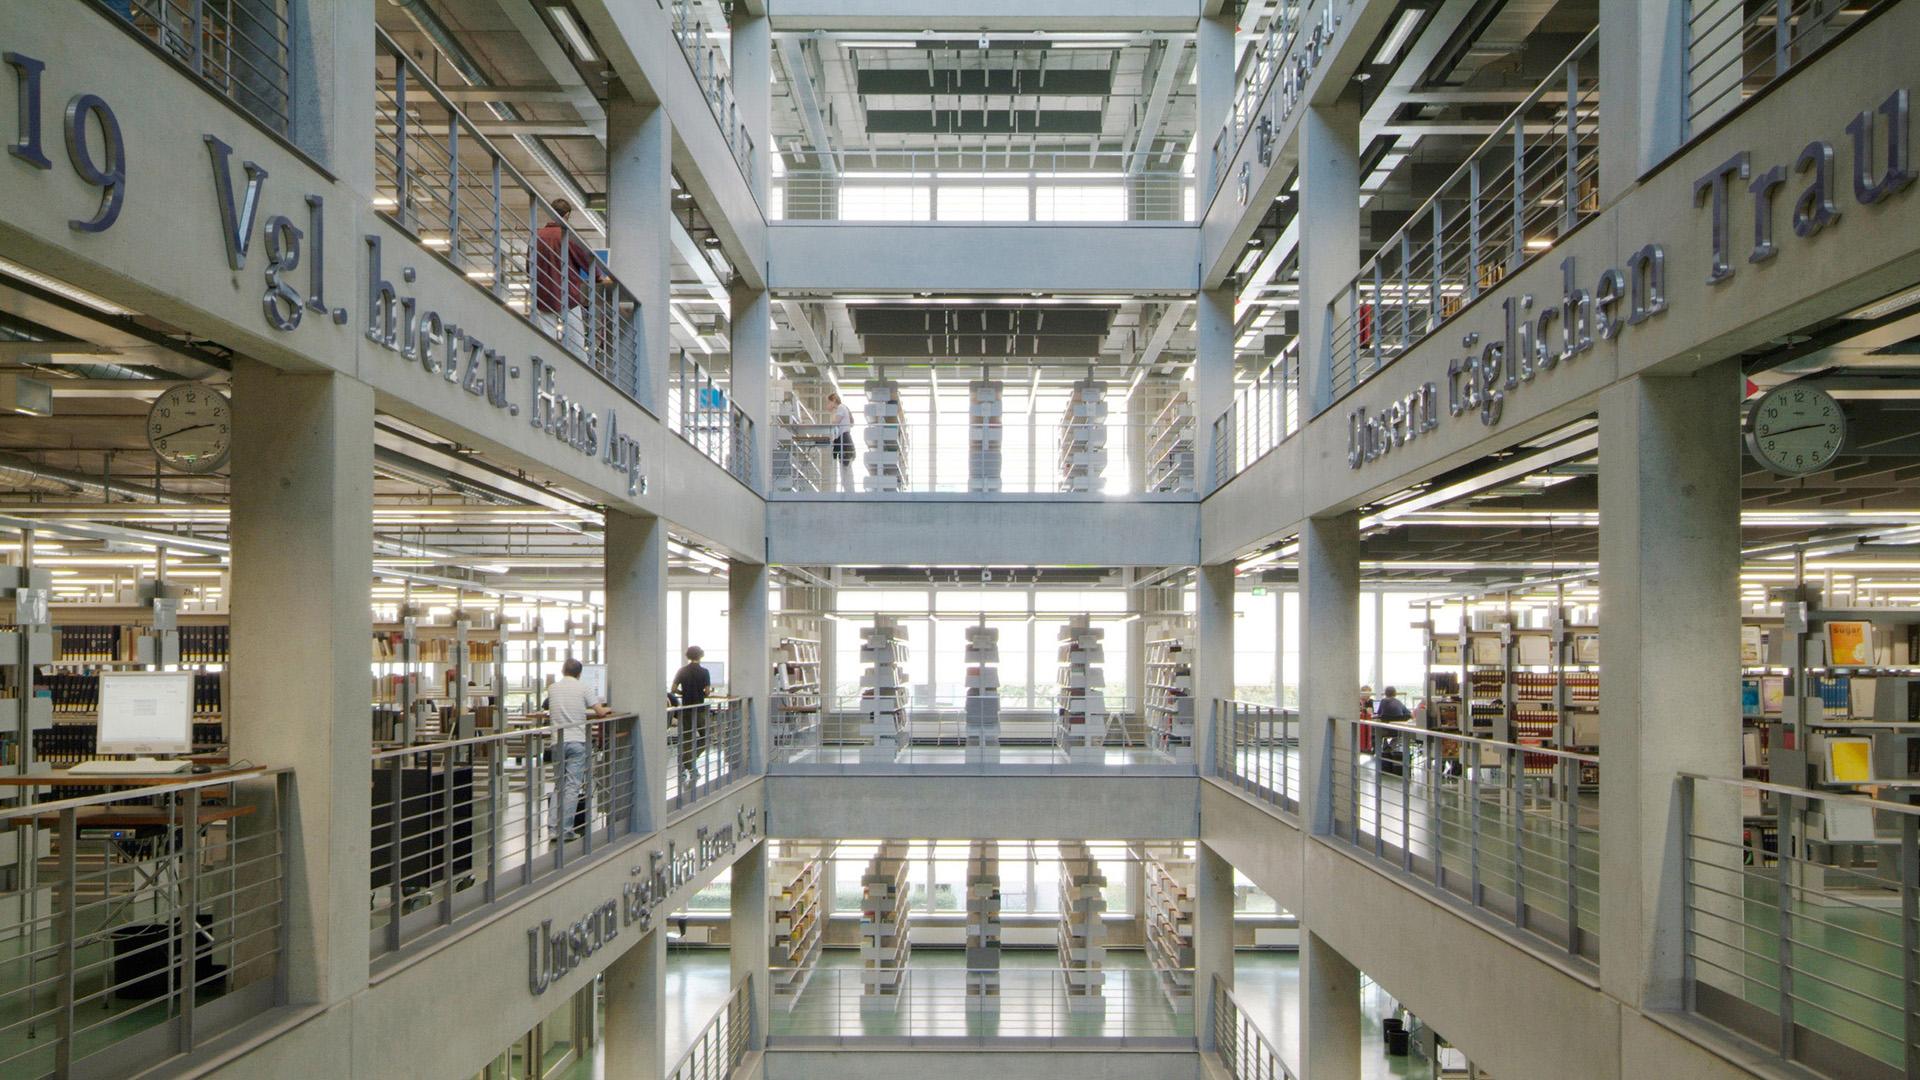 TU Universitaetsbibliothek